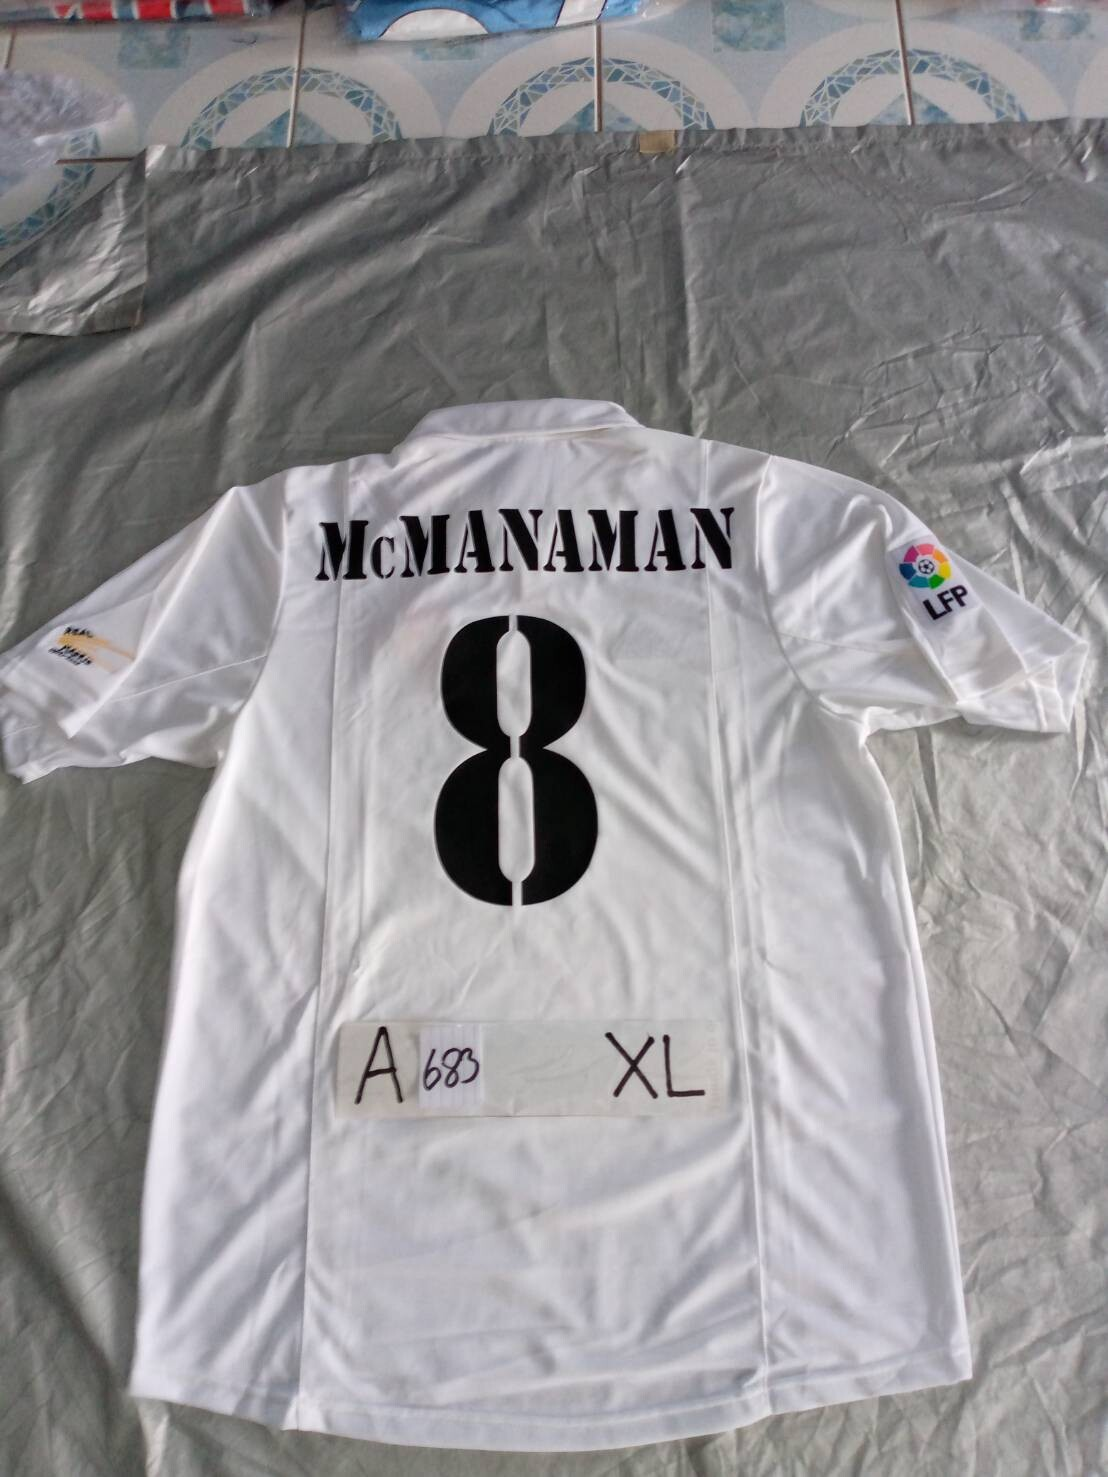 683  REAL MADRID MAGLIA CASA JERSEY HOME MCMANAMAN 8 TAGLIA XL SIZE XL